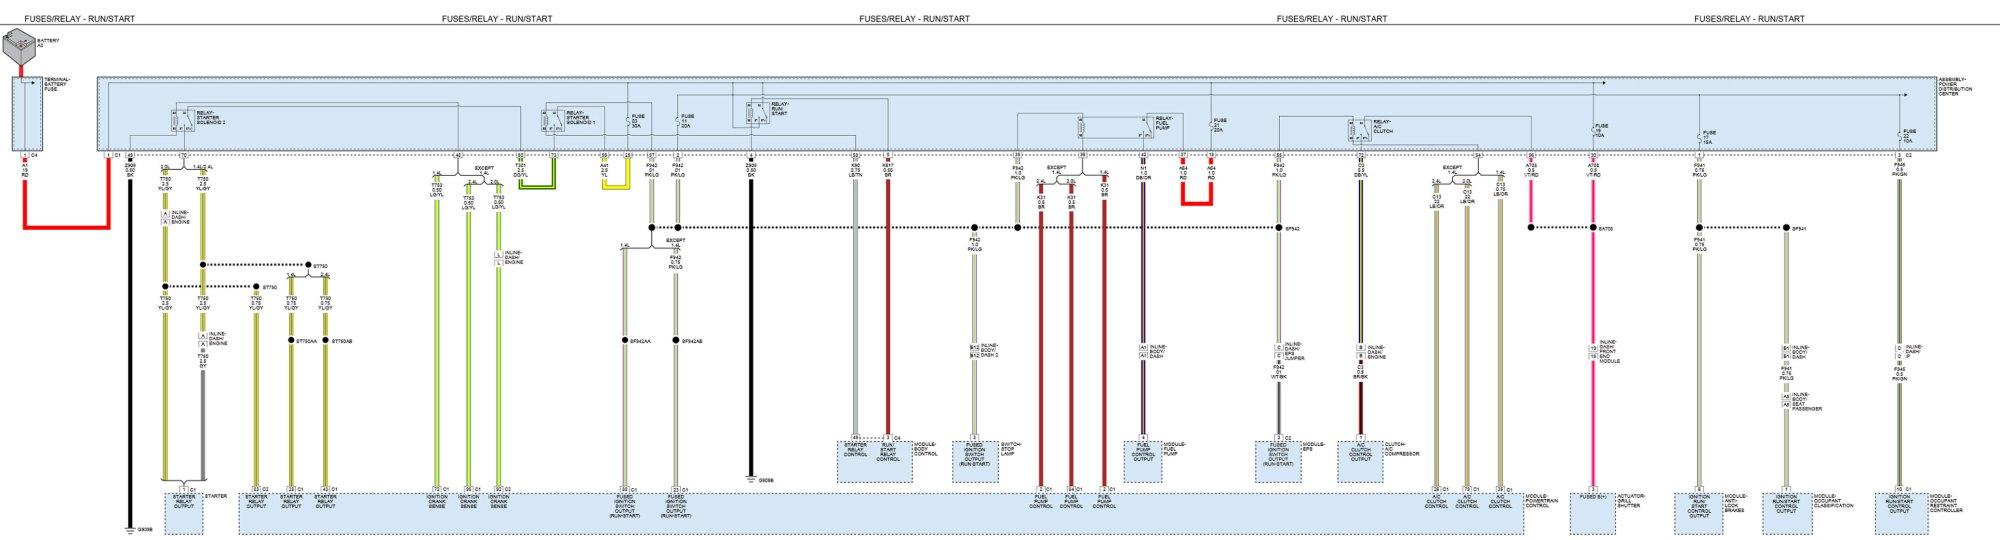 hight resolution of 2013 dodge dart fuse box f 84 wiring diagram 2013 dodge dart fuse box f 84